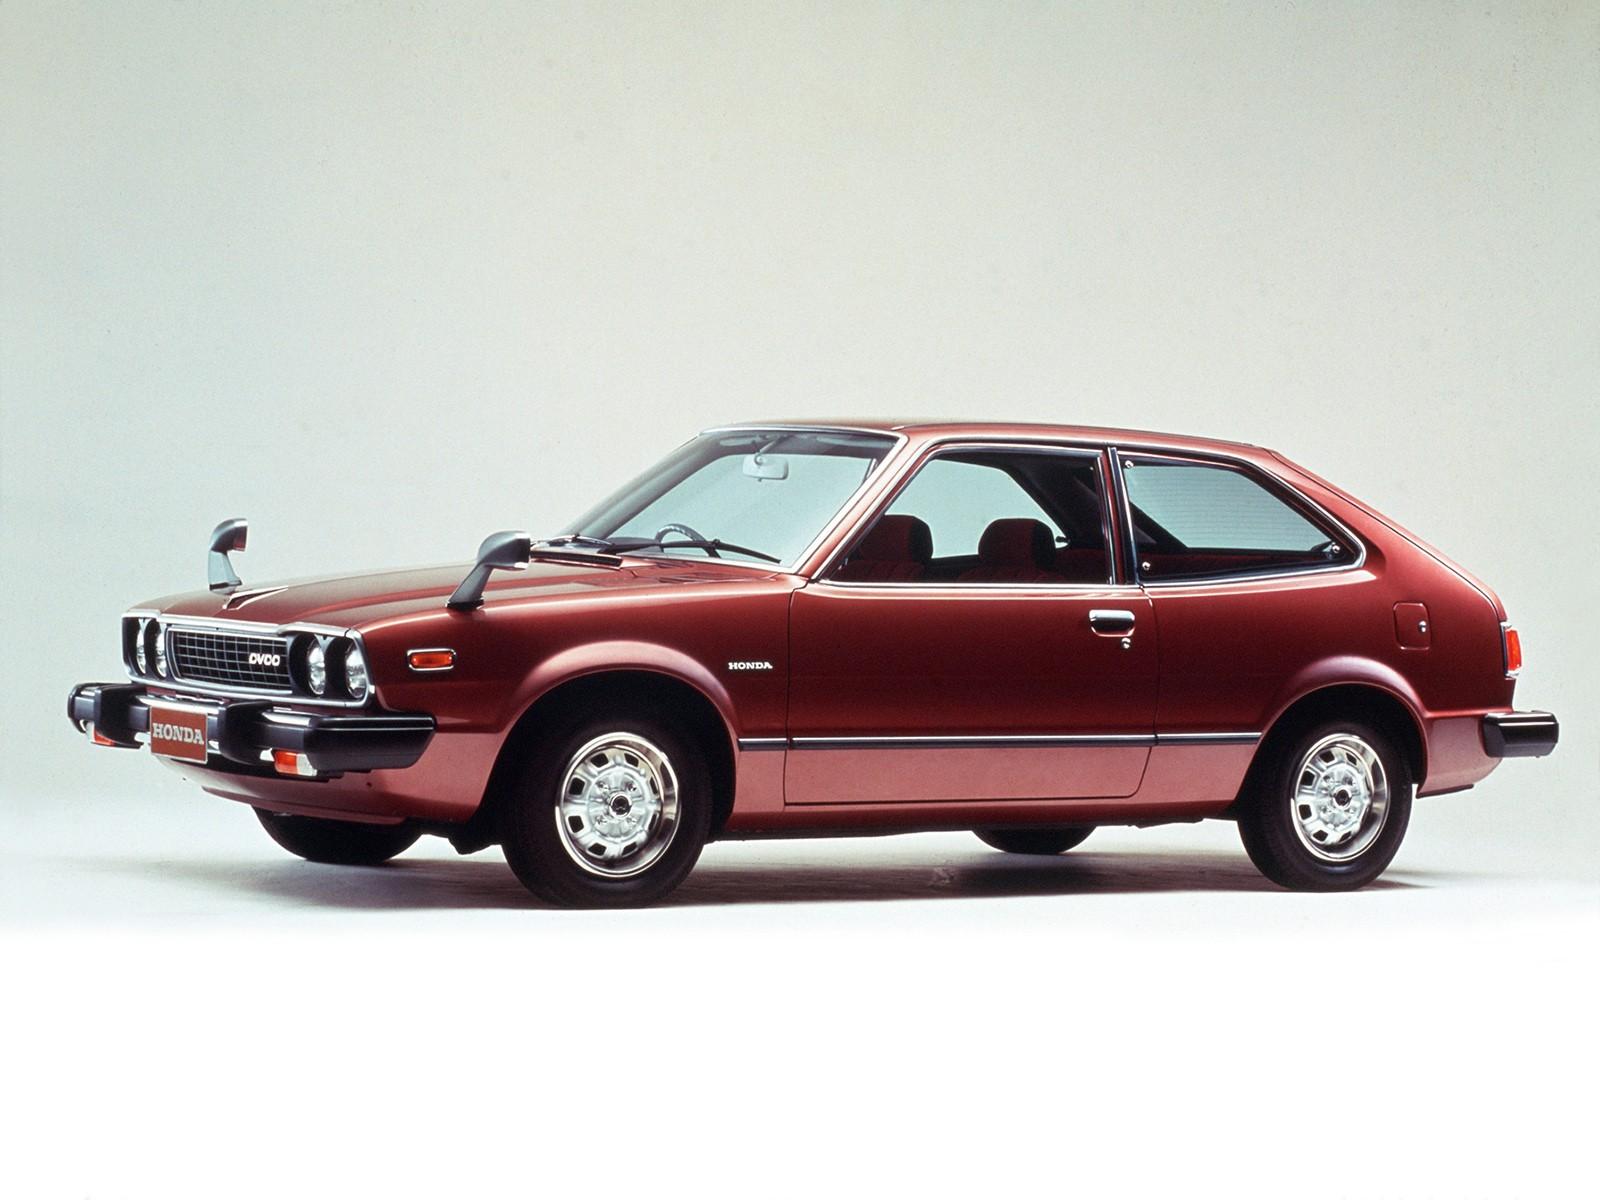 Honda Accord I 1976 - 1981 Hatchback 3 door #3